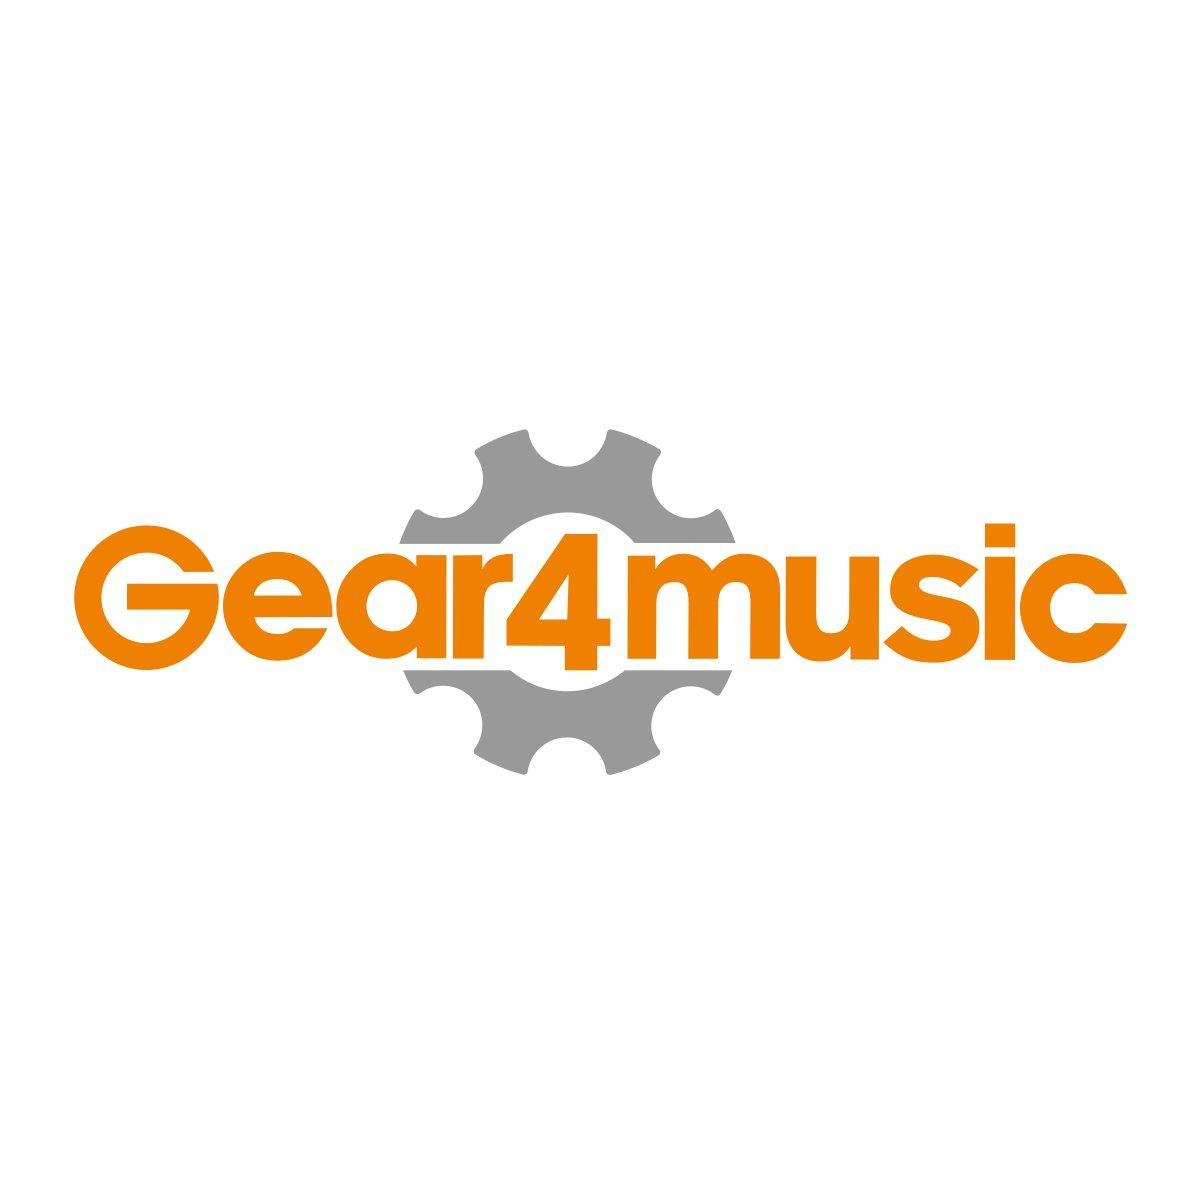 Chitarra elettrica New Jersey per mancini by Gear4music, nera